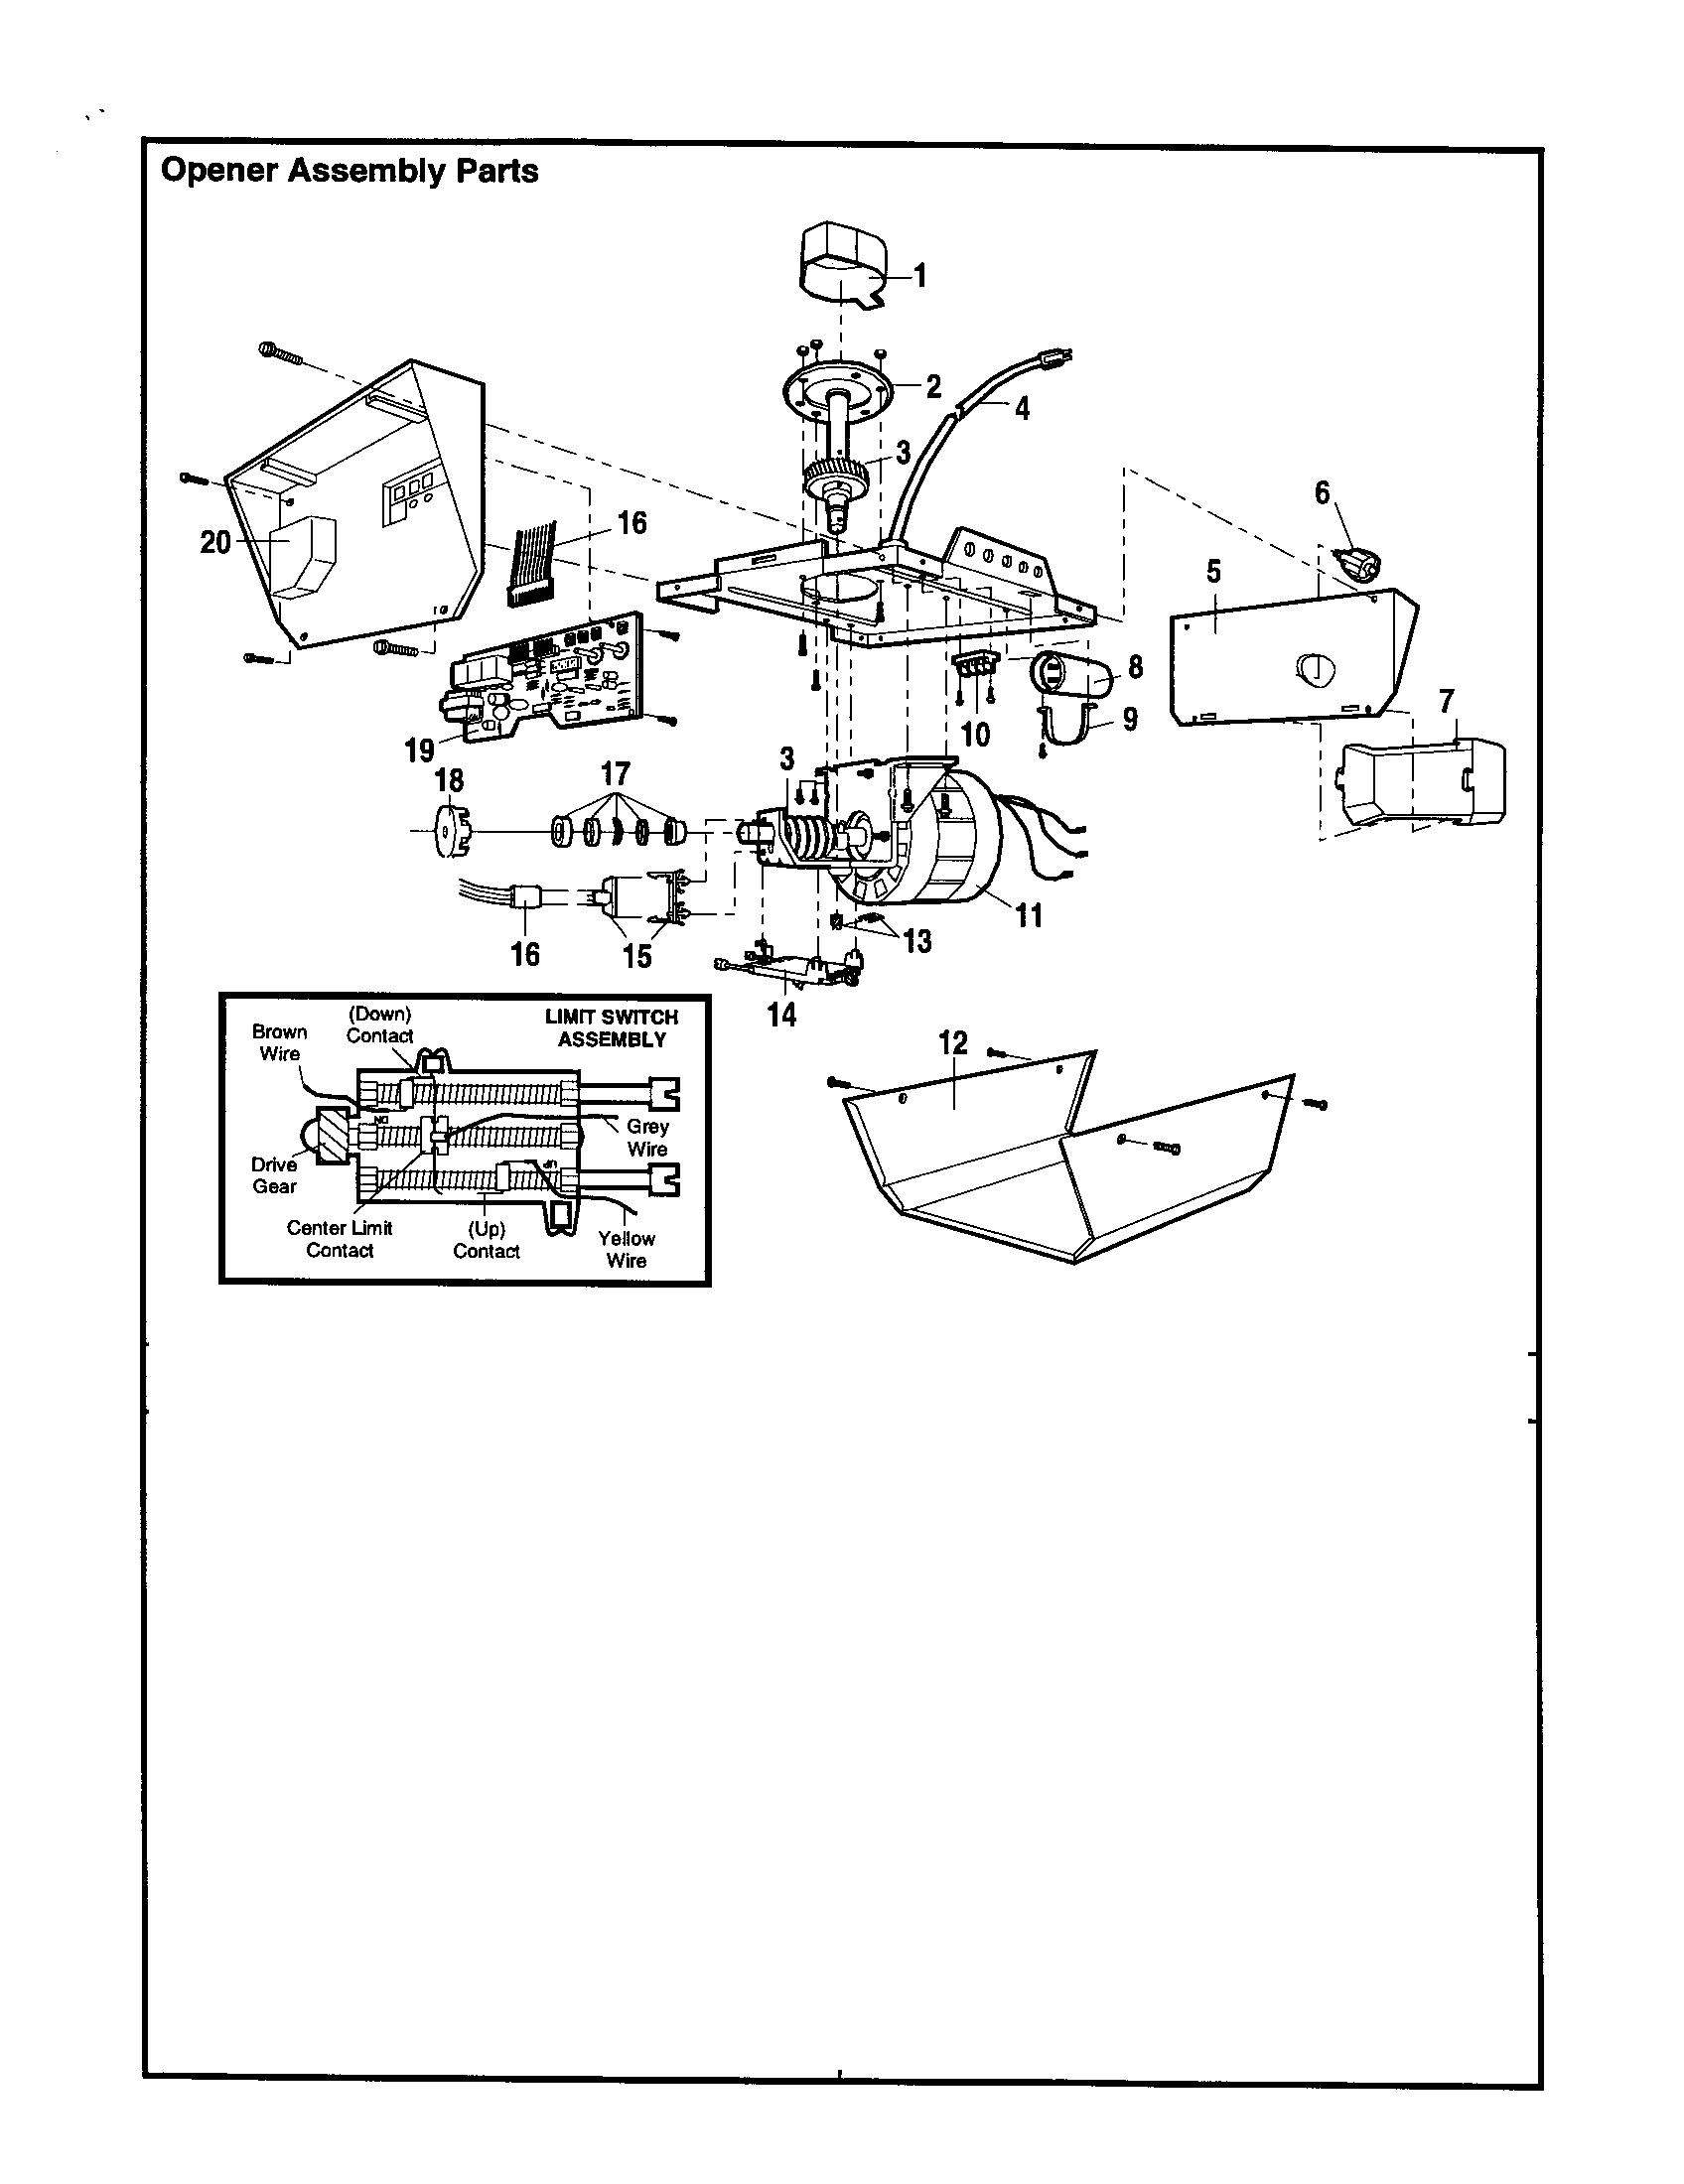 opener assembly diagram and parts list for craftsman garagedoor